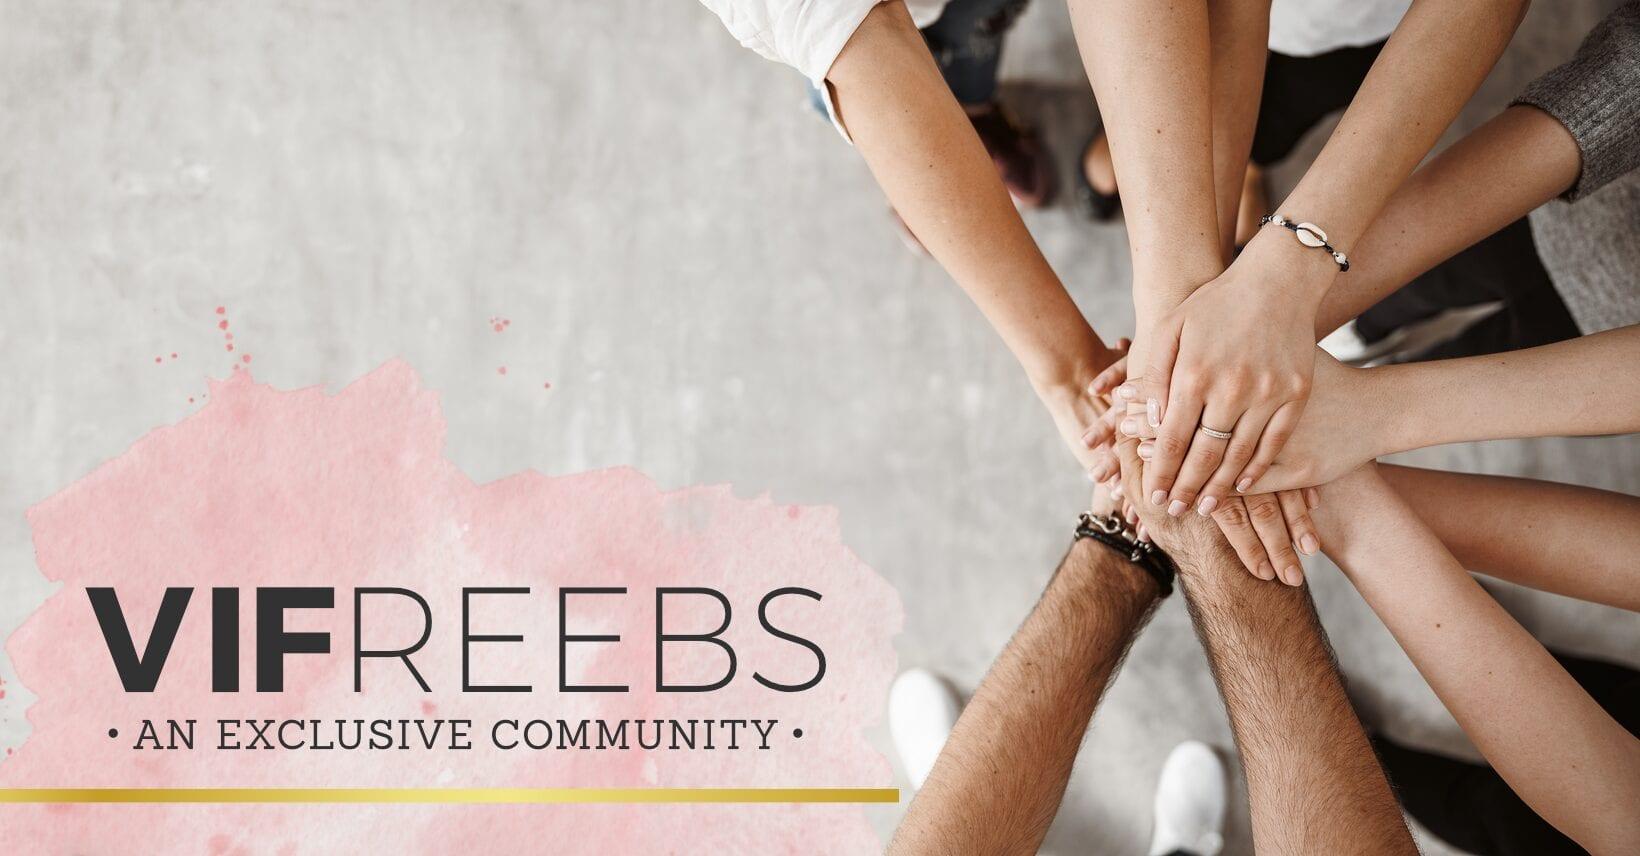 VIFreebs Exclusive Community